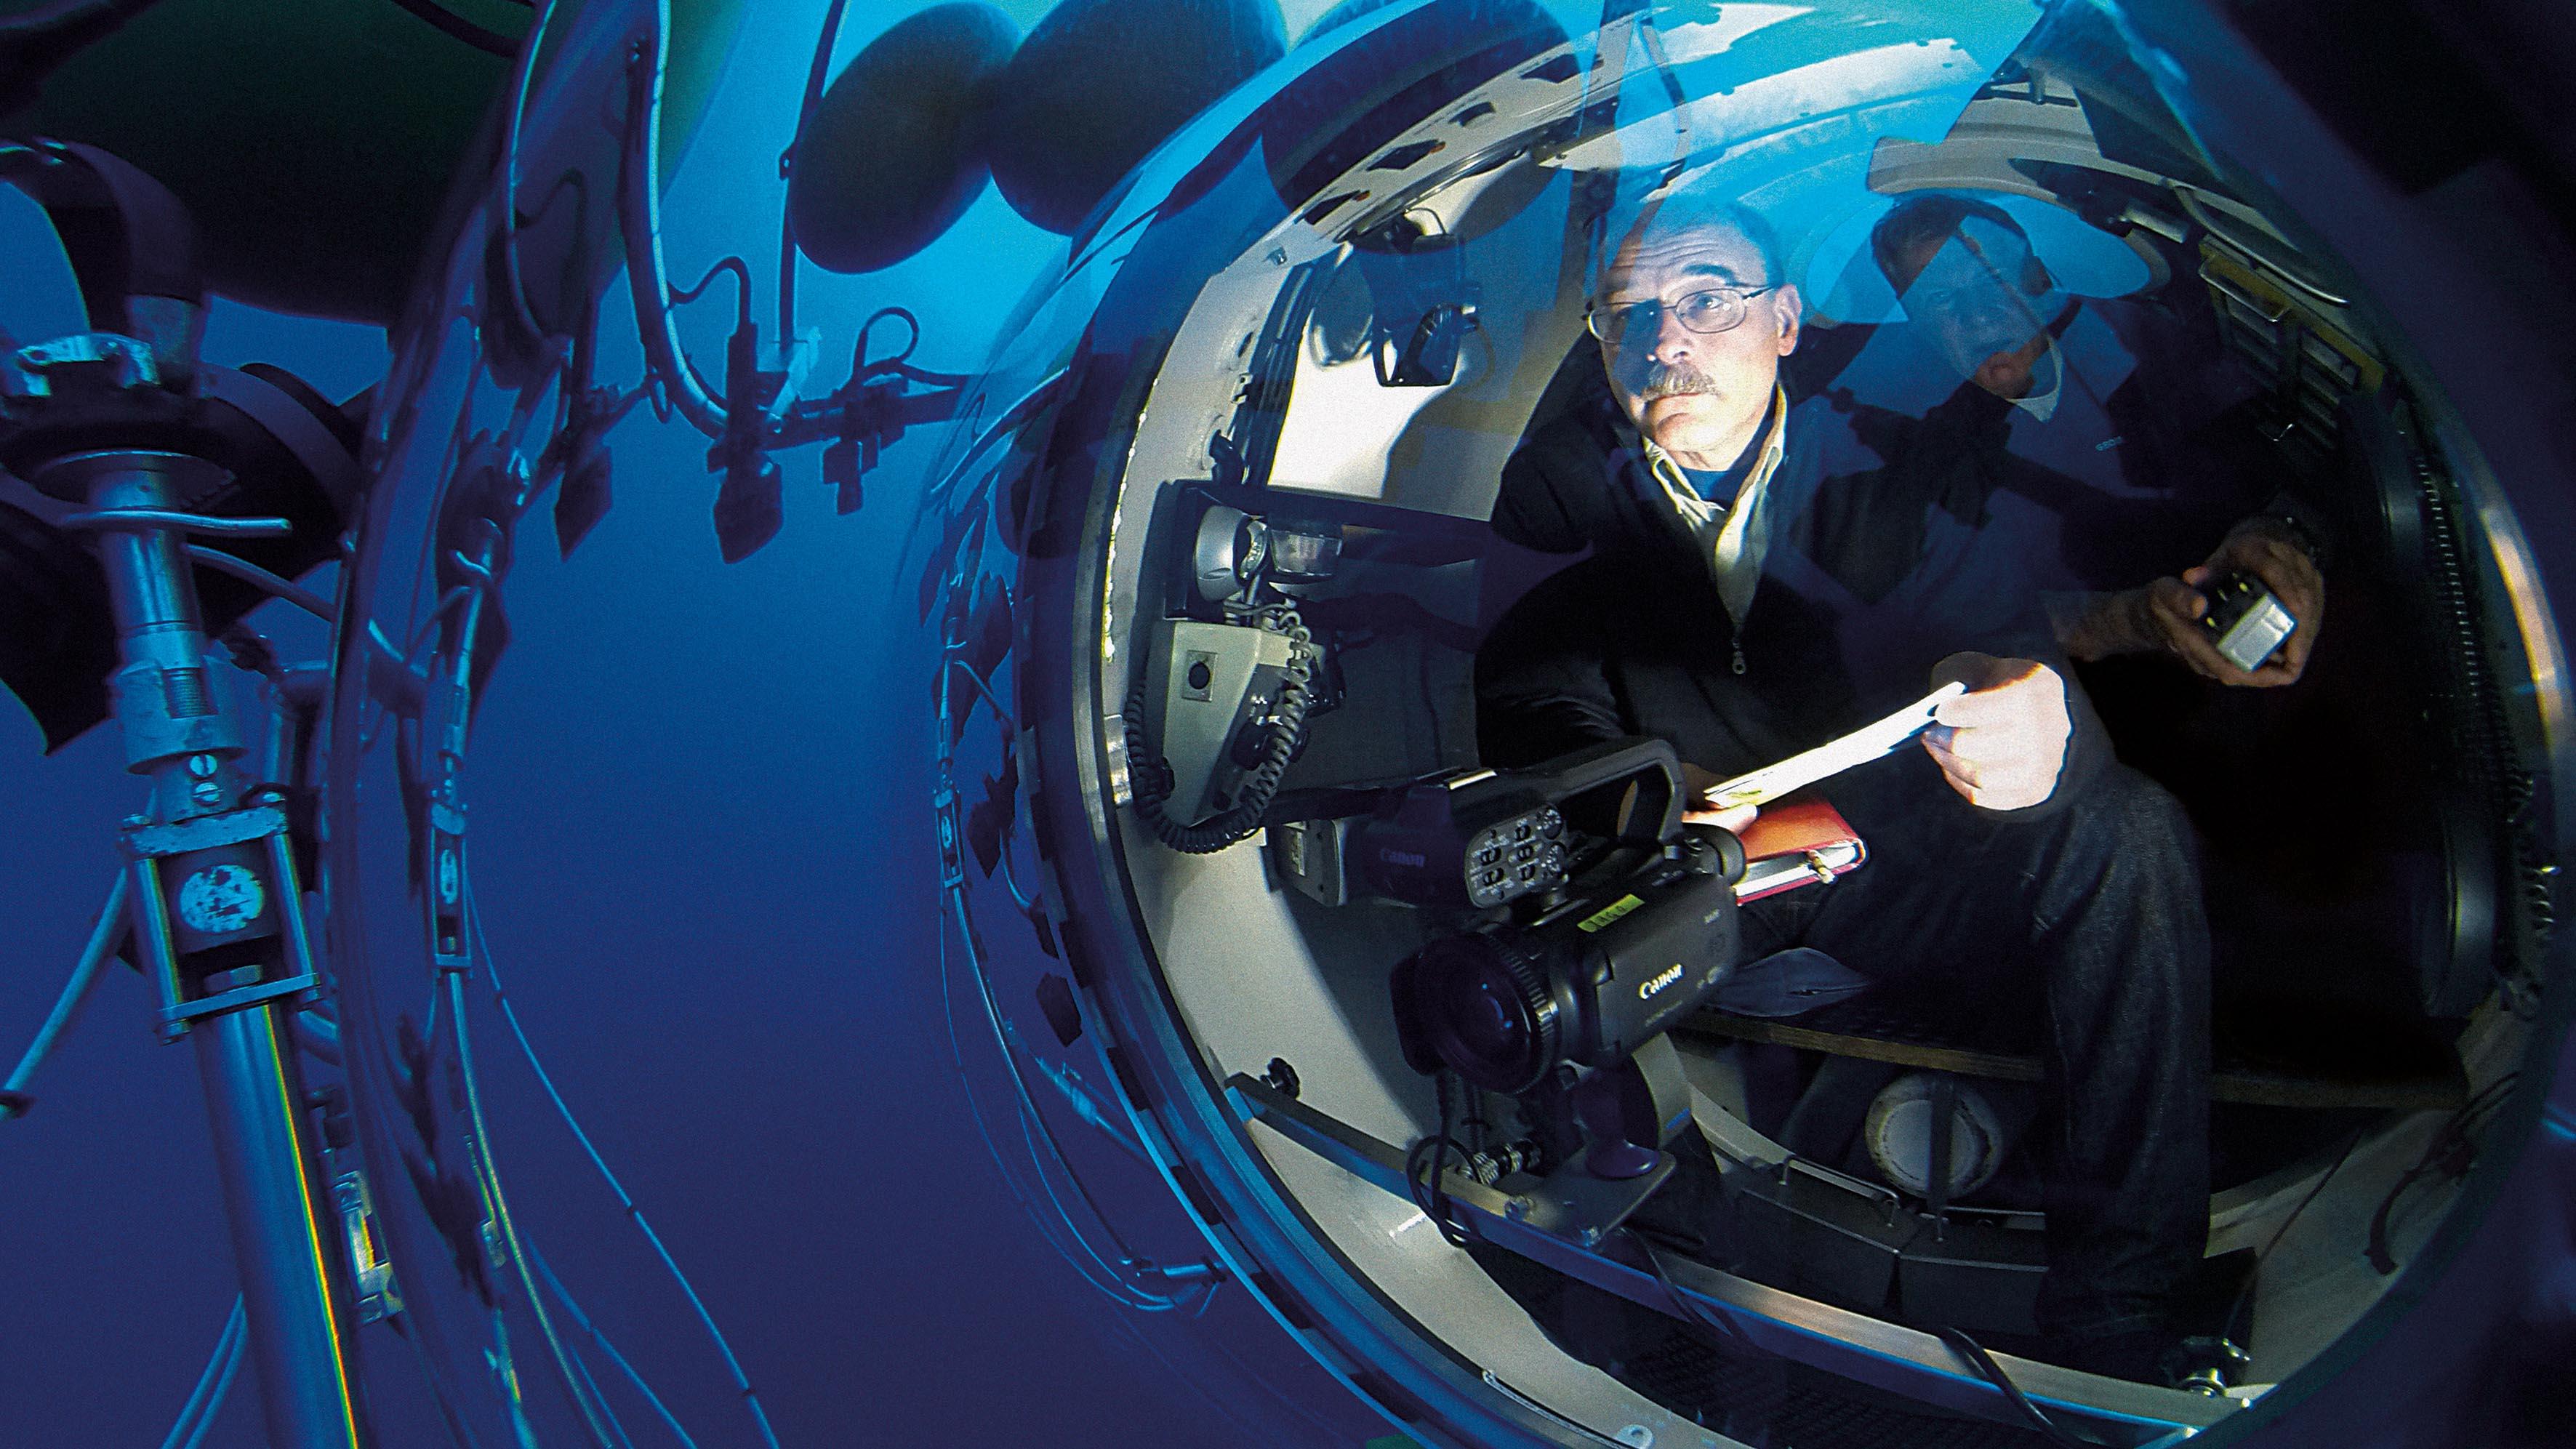 A man sitting in a submarine